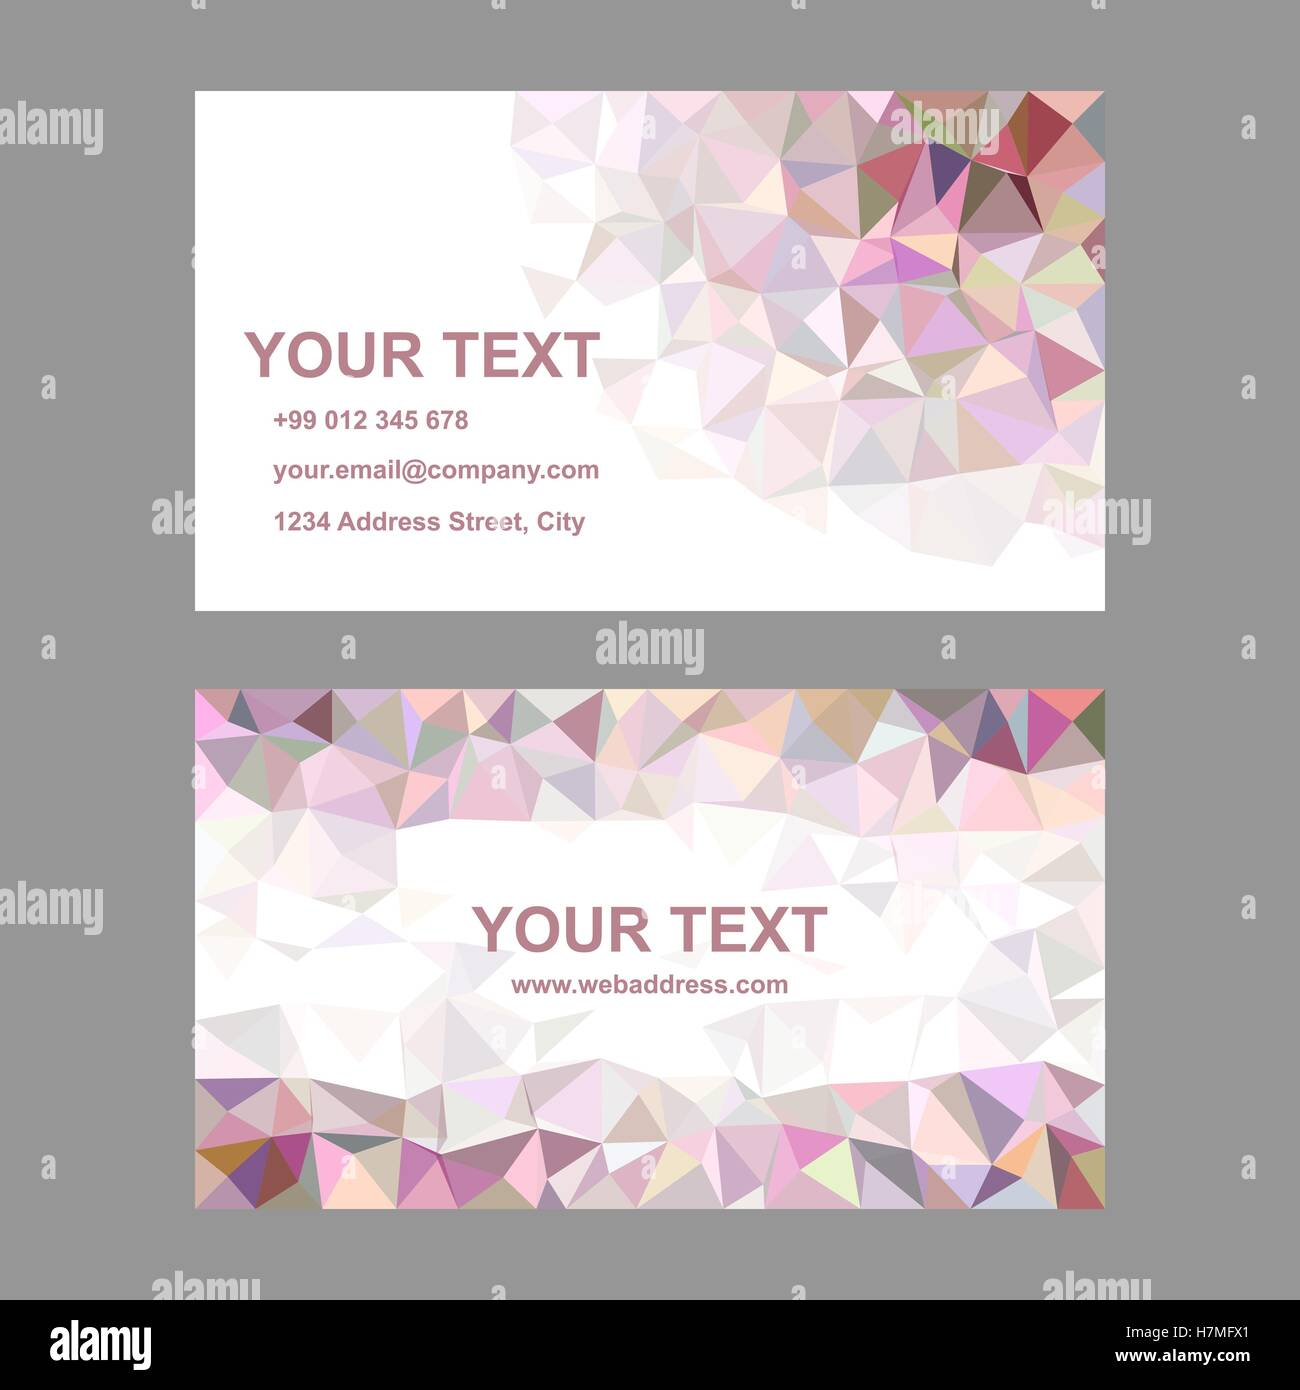 Multicolor triangle design business card template Stock Vector Art ...